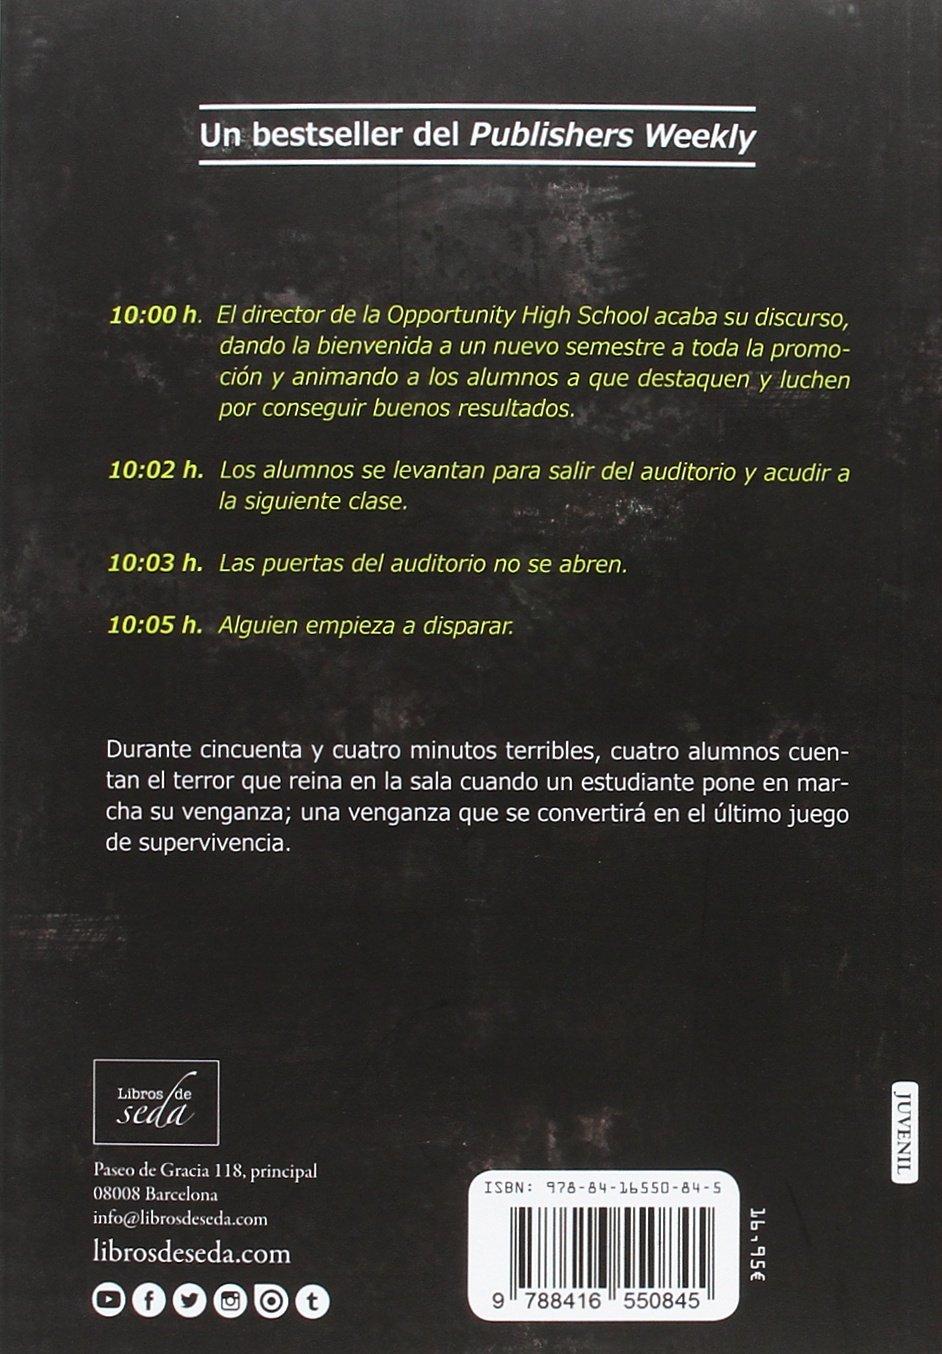 Balas en la pizarra (Spanish Edition): Marieke Nijkamp, Libros de Seda: 9788416550845: Amazon.com: Books